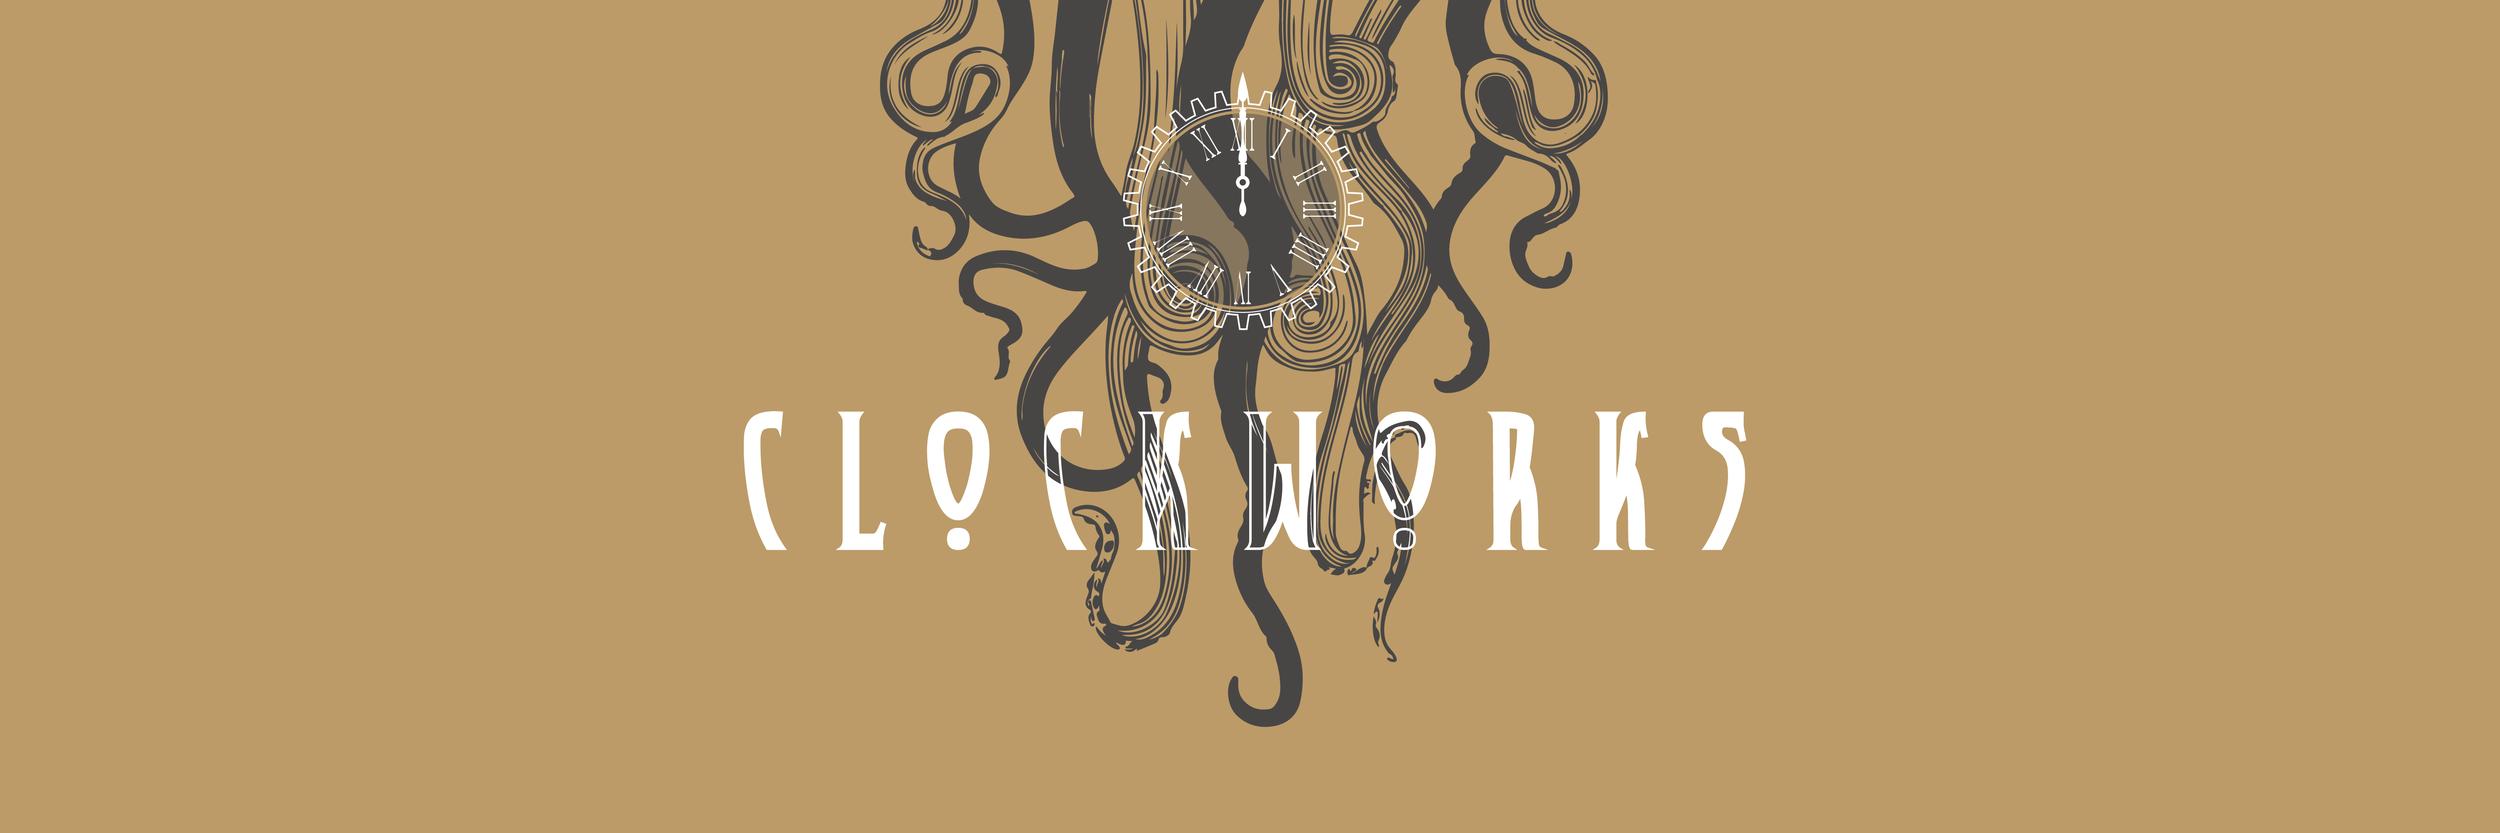 Clockworks Twitter Cover.png